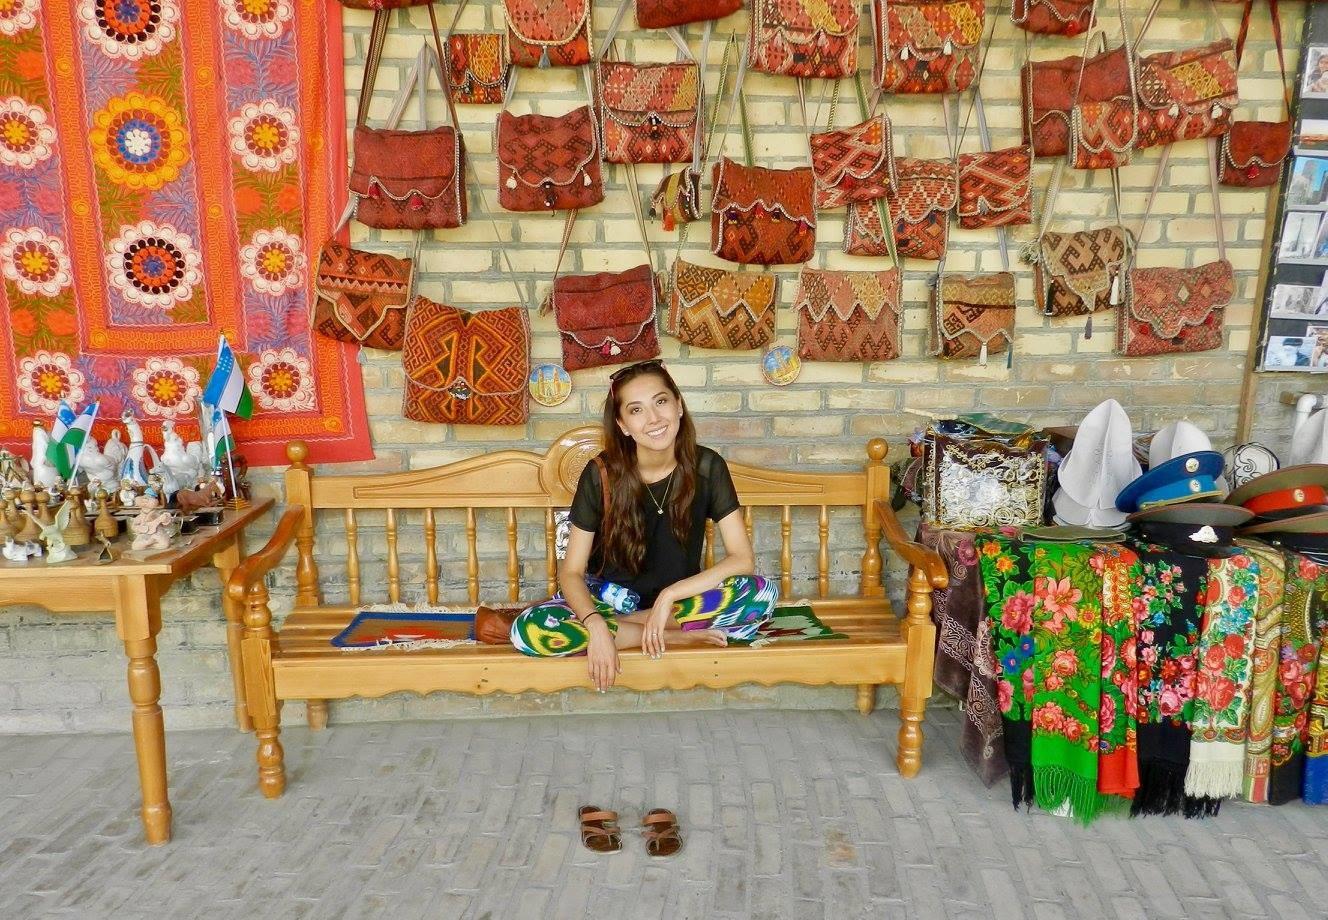 bukhara-uzbekistan-be32078abb229ce7bc90e